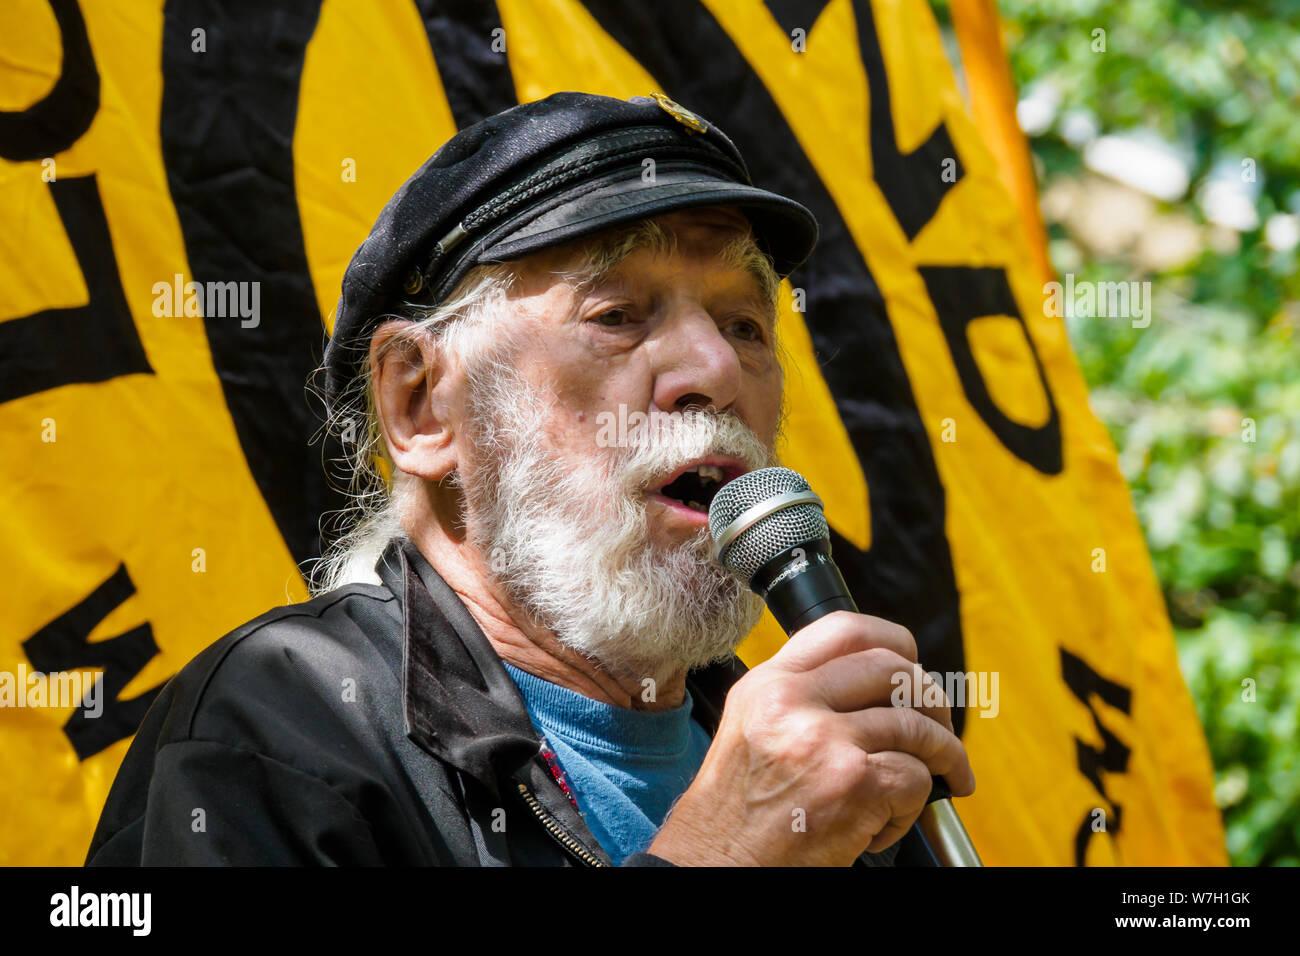 London, UK  6th August 2019  Folk singer and D-Day veteran